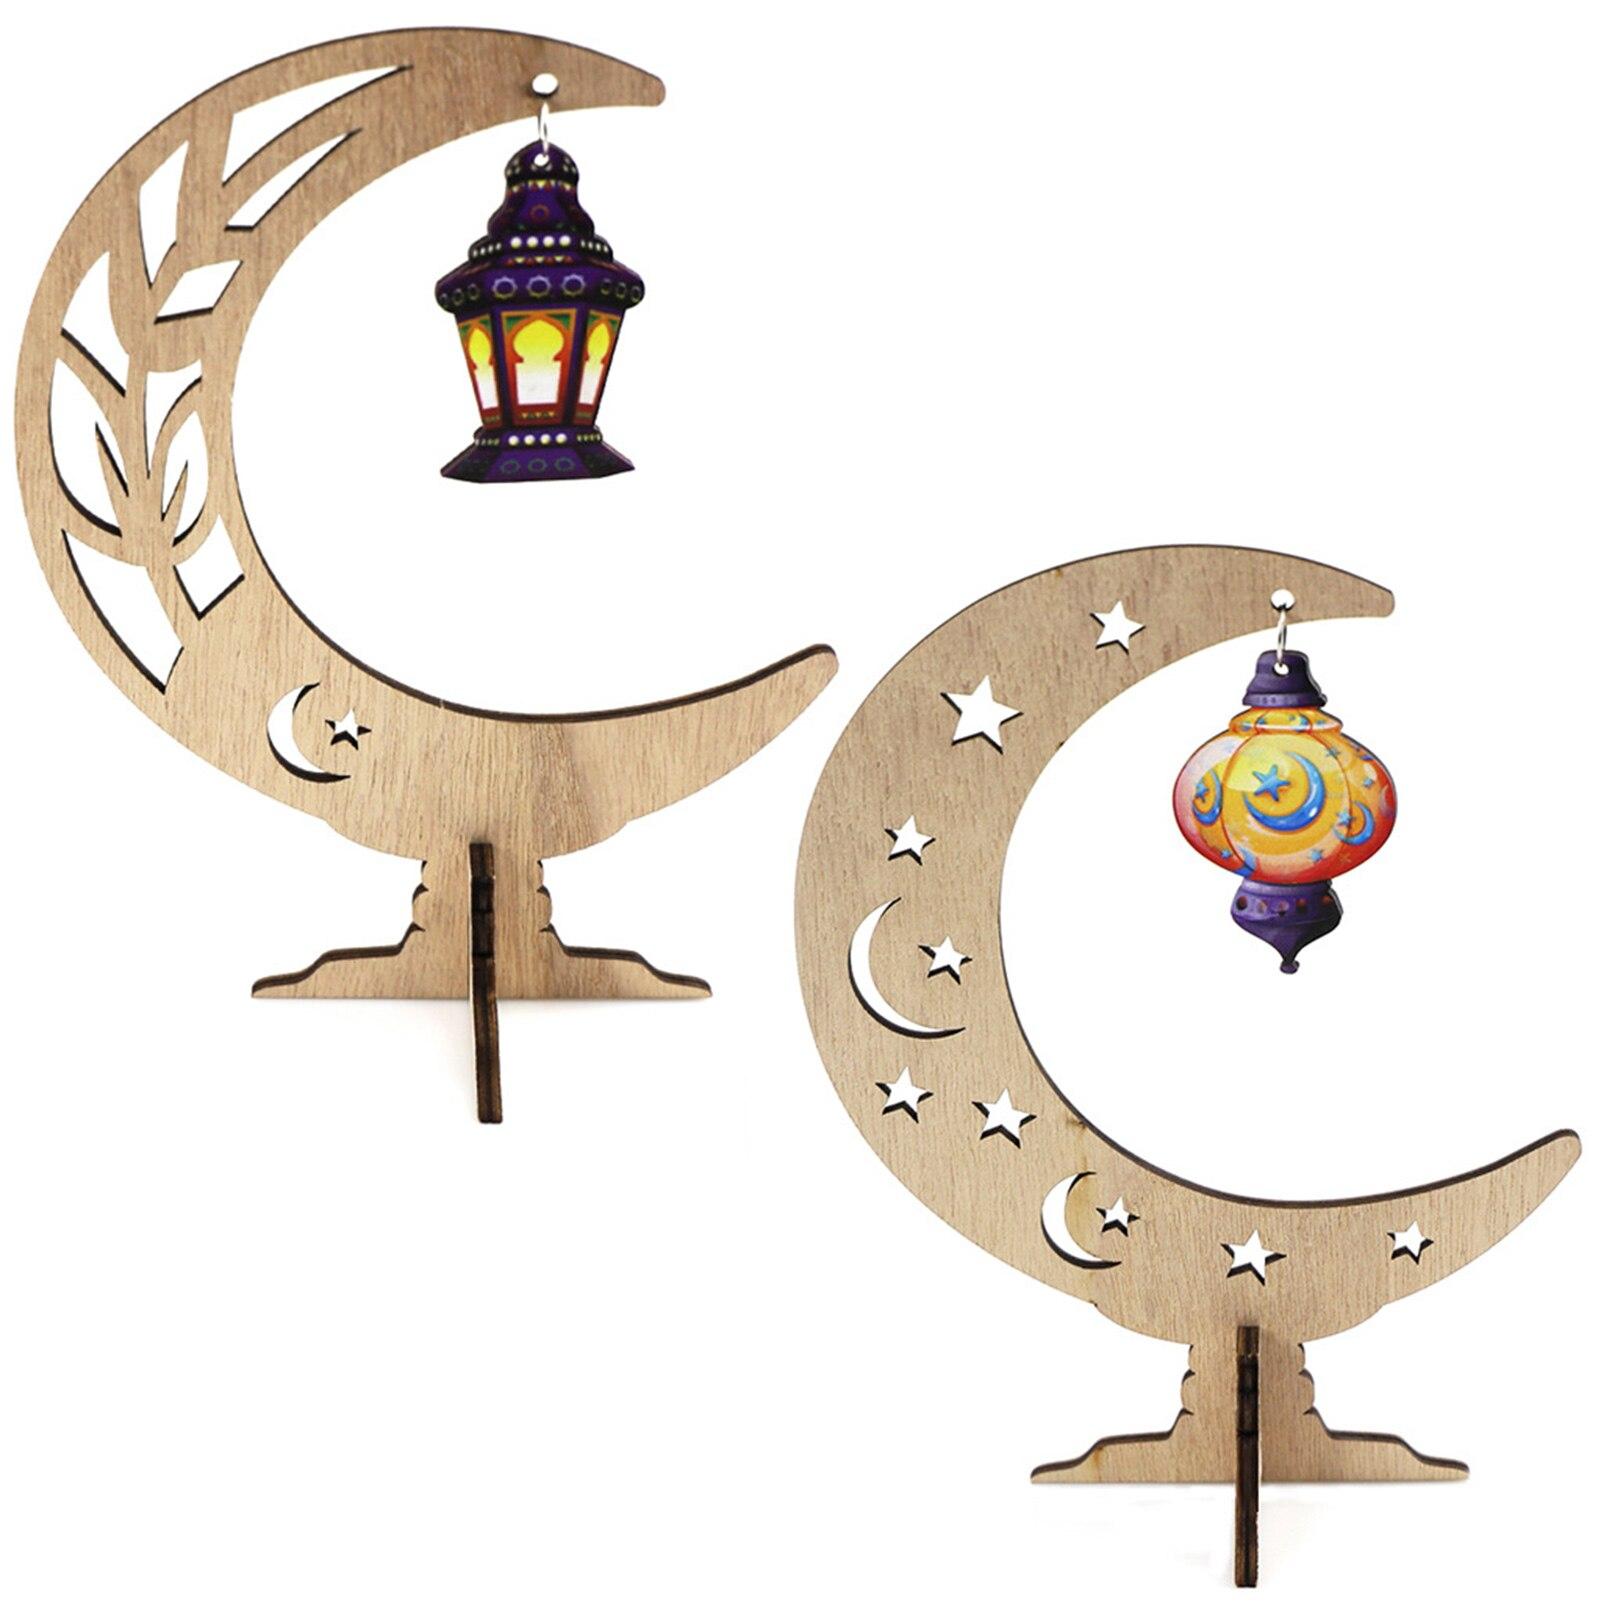 Home Decor DIY Wooden Eid Crafts Islam Mubarak Party Supplies Moon Ornament Ramadan Decoration